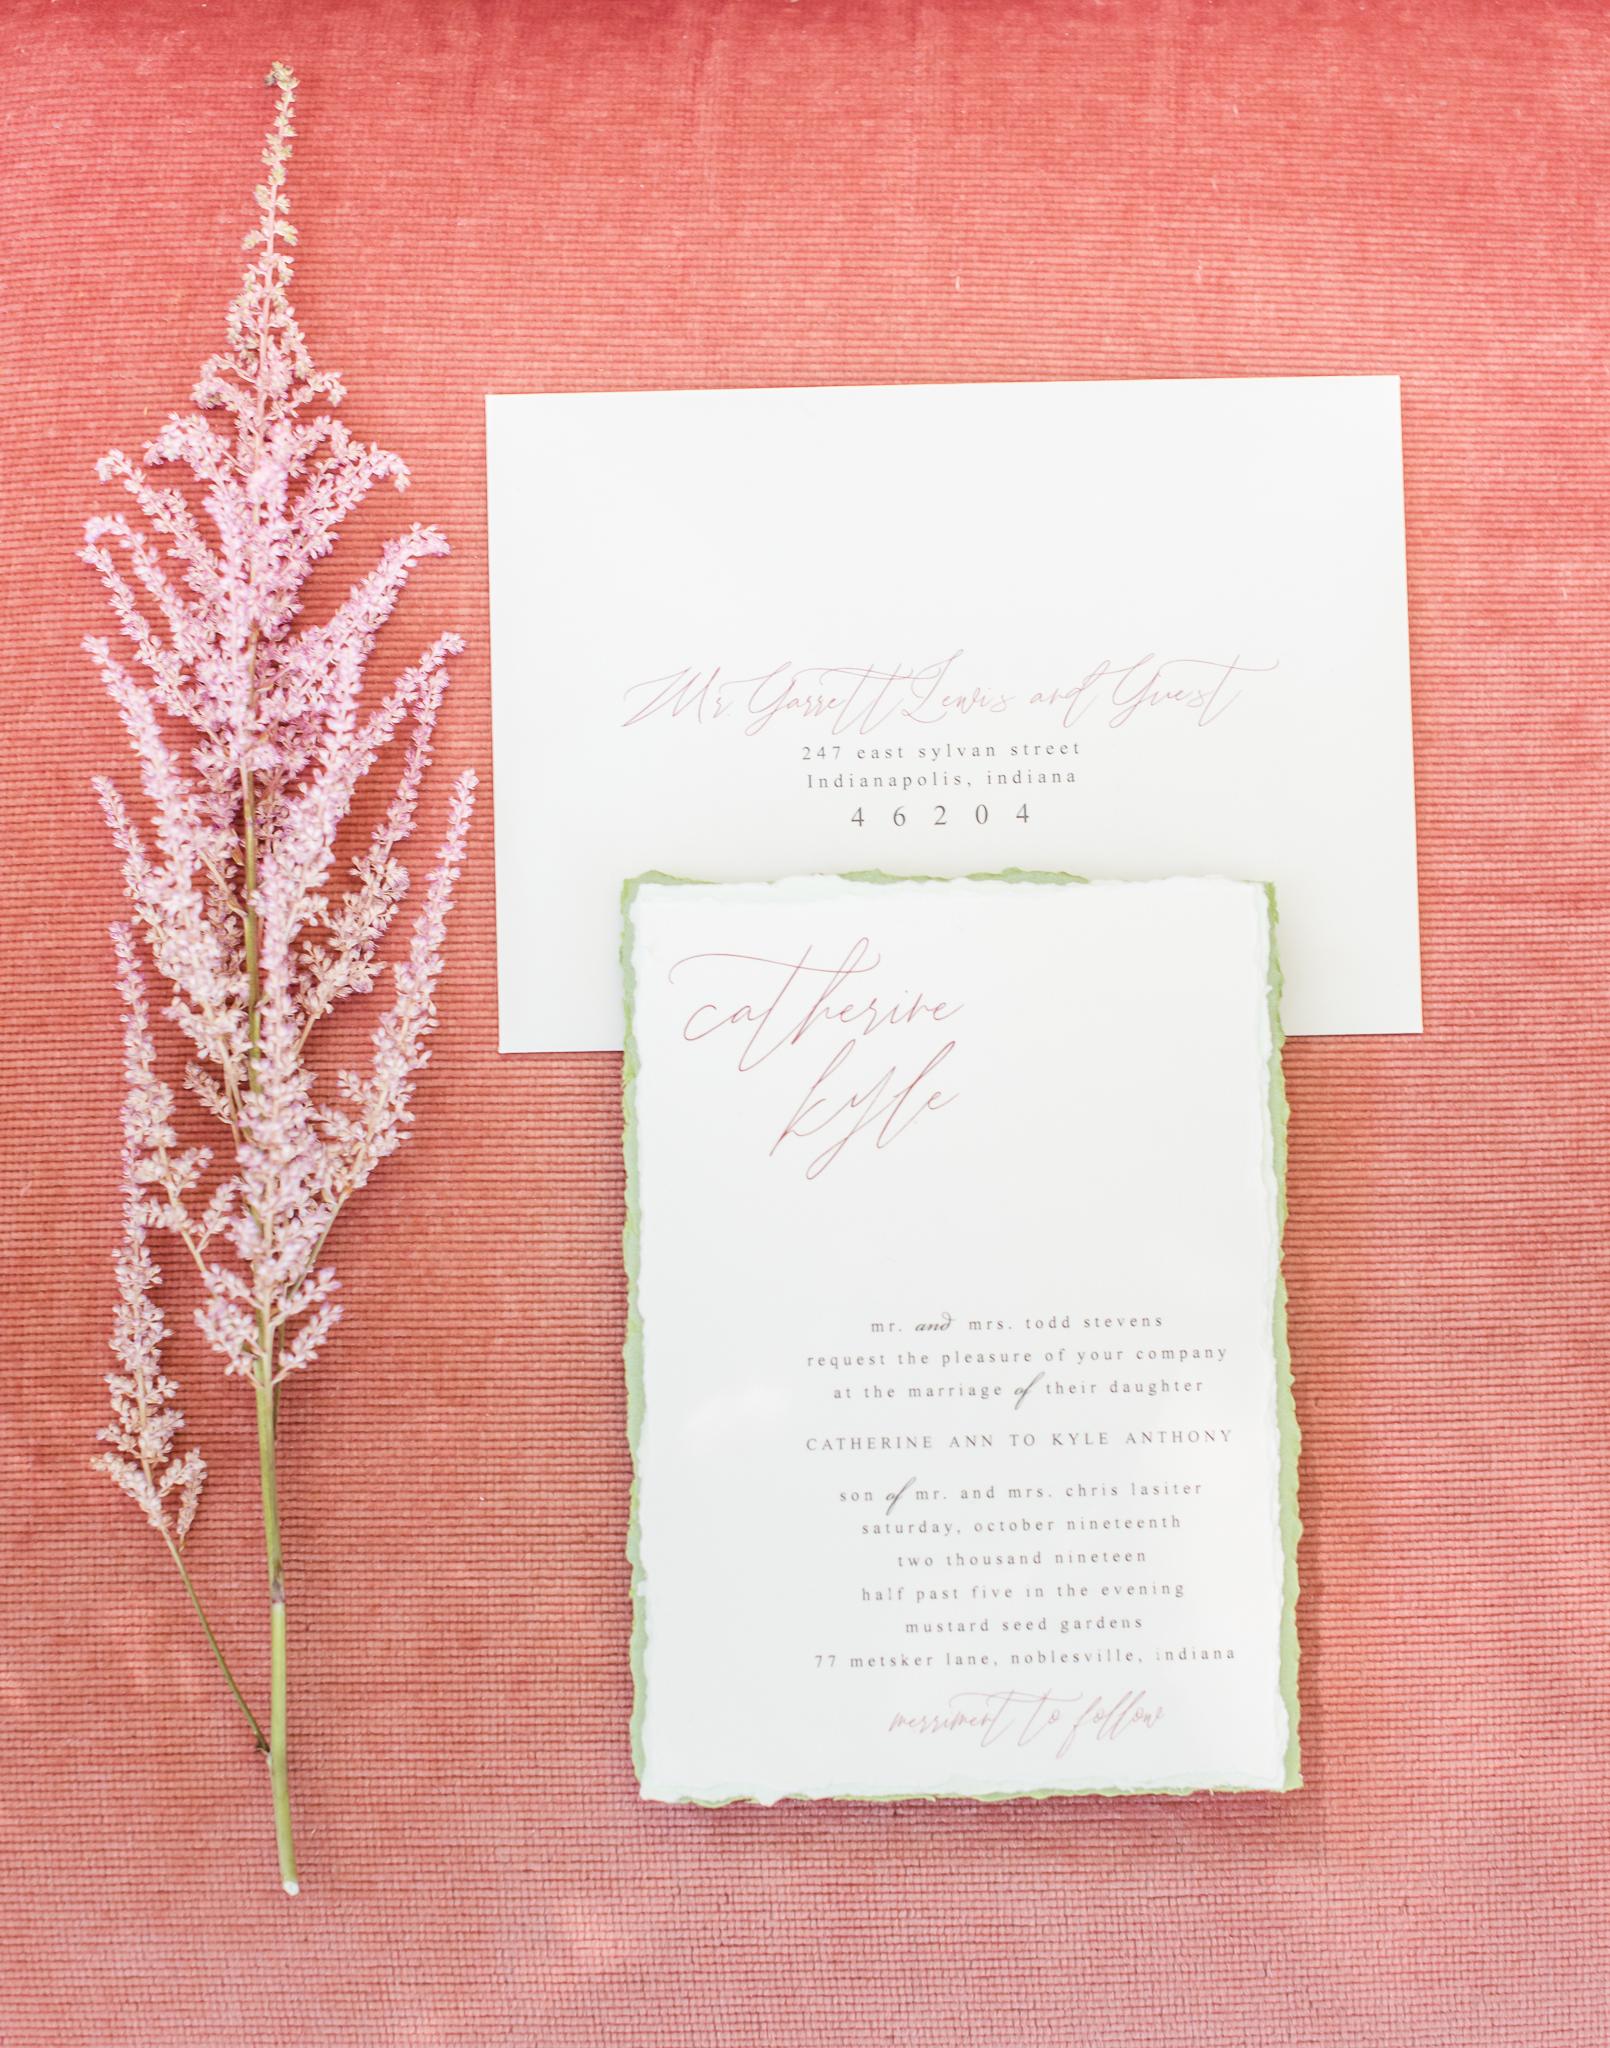 Mustard Seed Gardens Wedding Indianapolis Noblesvile Fishers Wedding Photographer.jpg